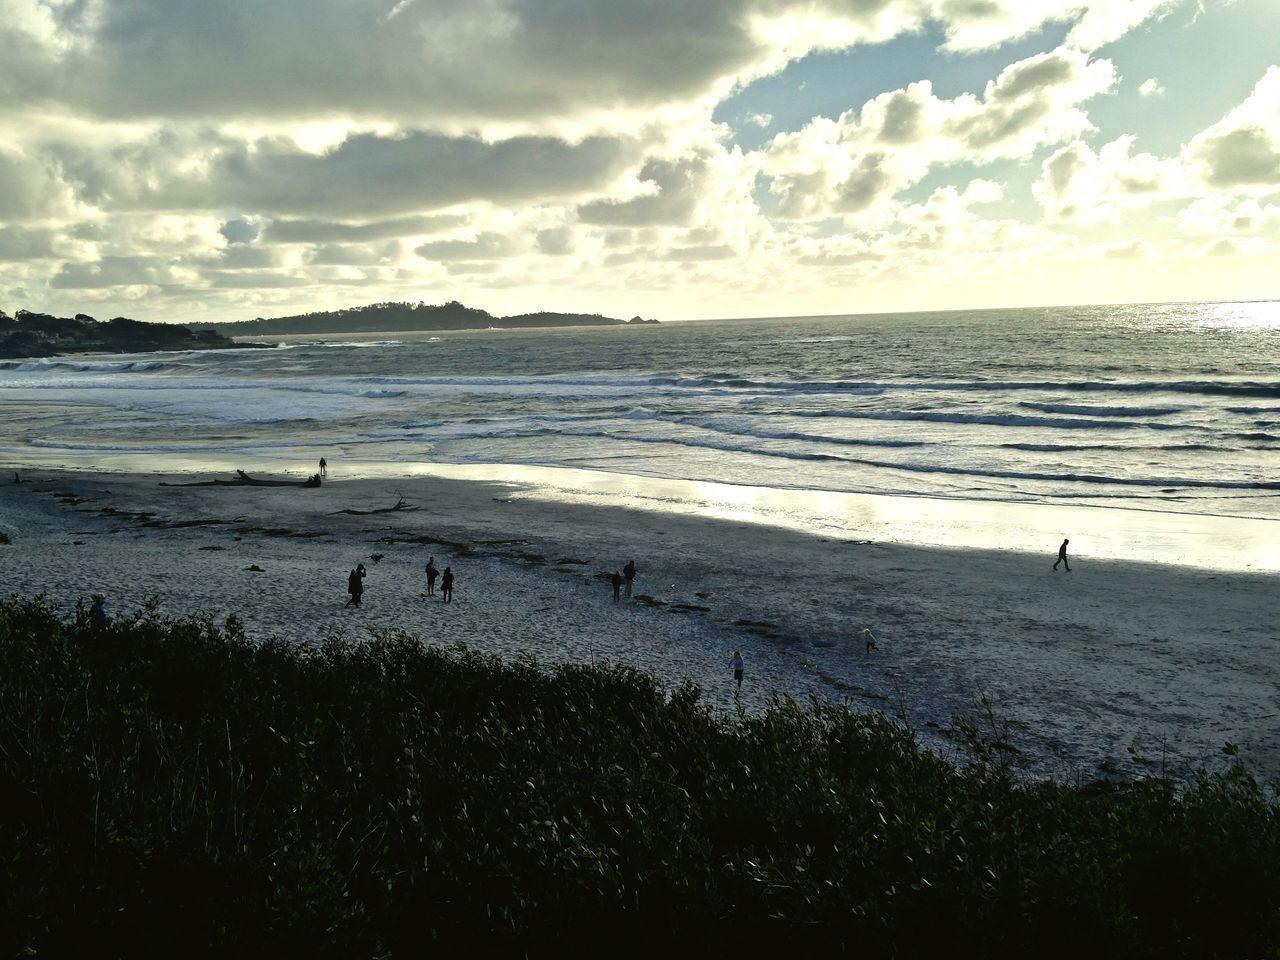 Carmel beach. Where I found serenity. Soothing my burning soul